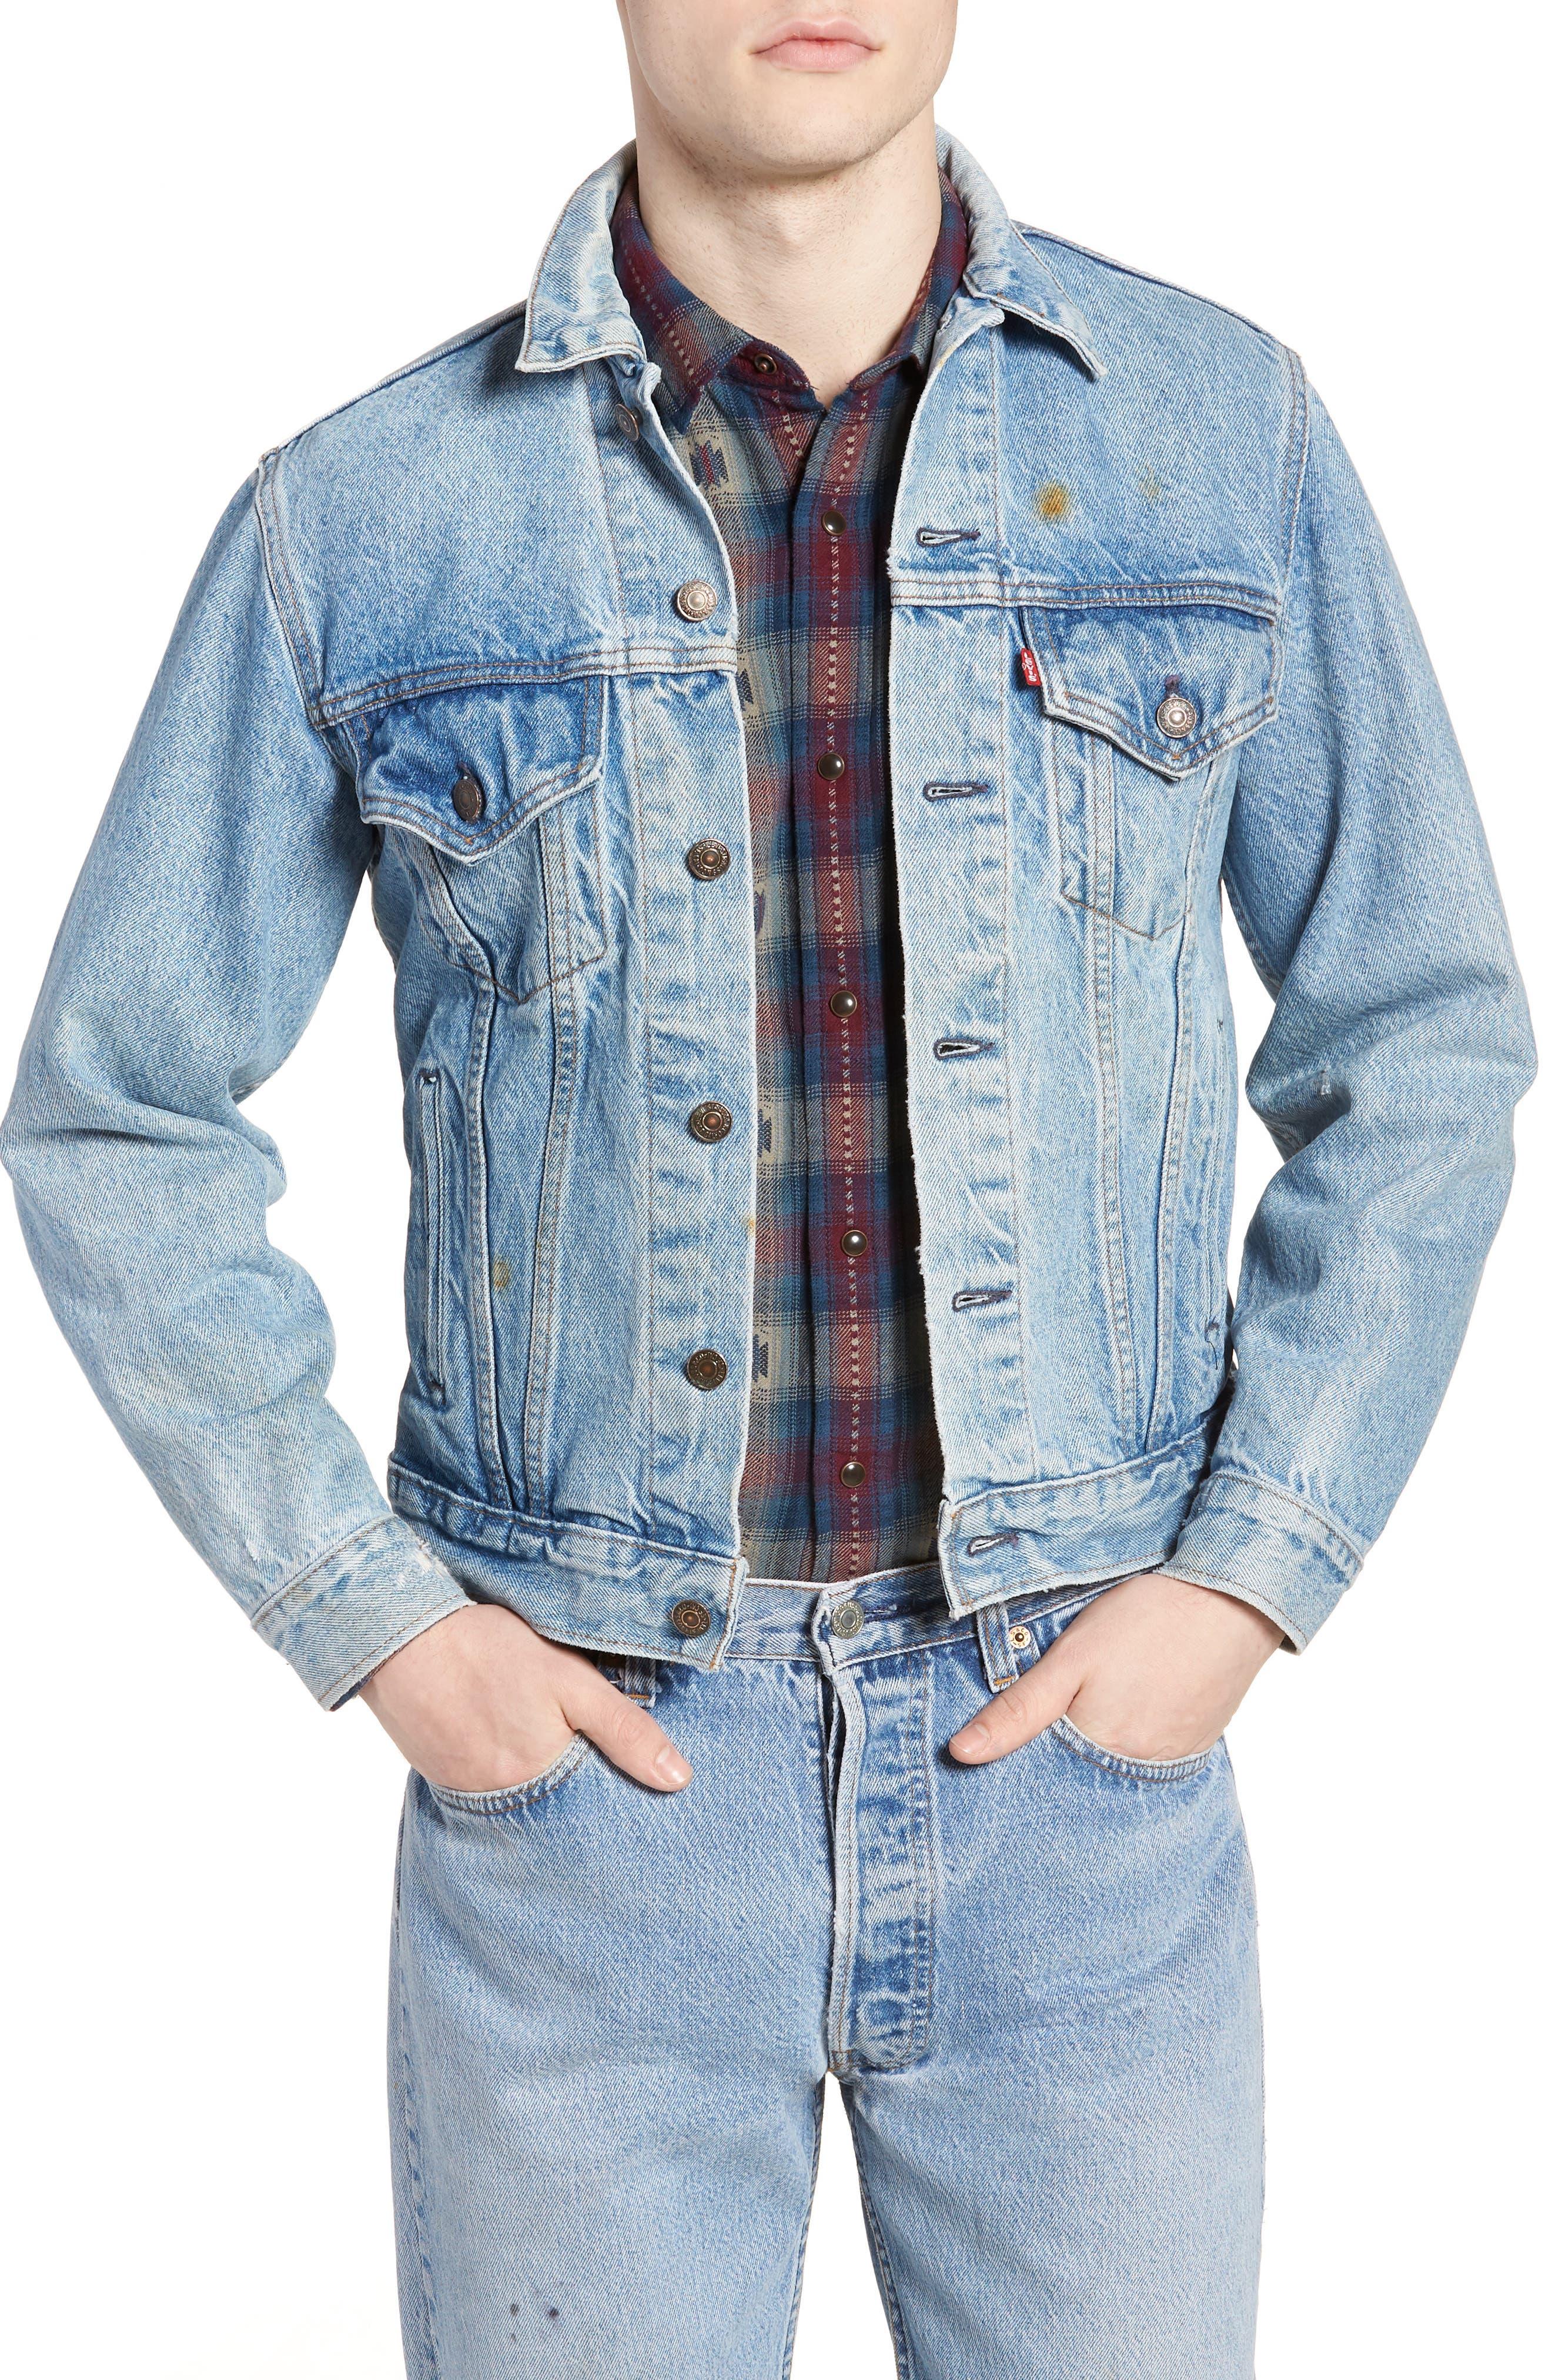 Authorized Vintage Trucker Jacket,                             Main thumbnail 1, color,                             AV BLUE